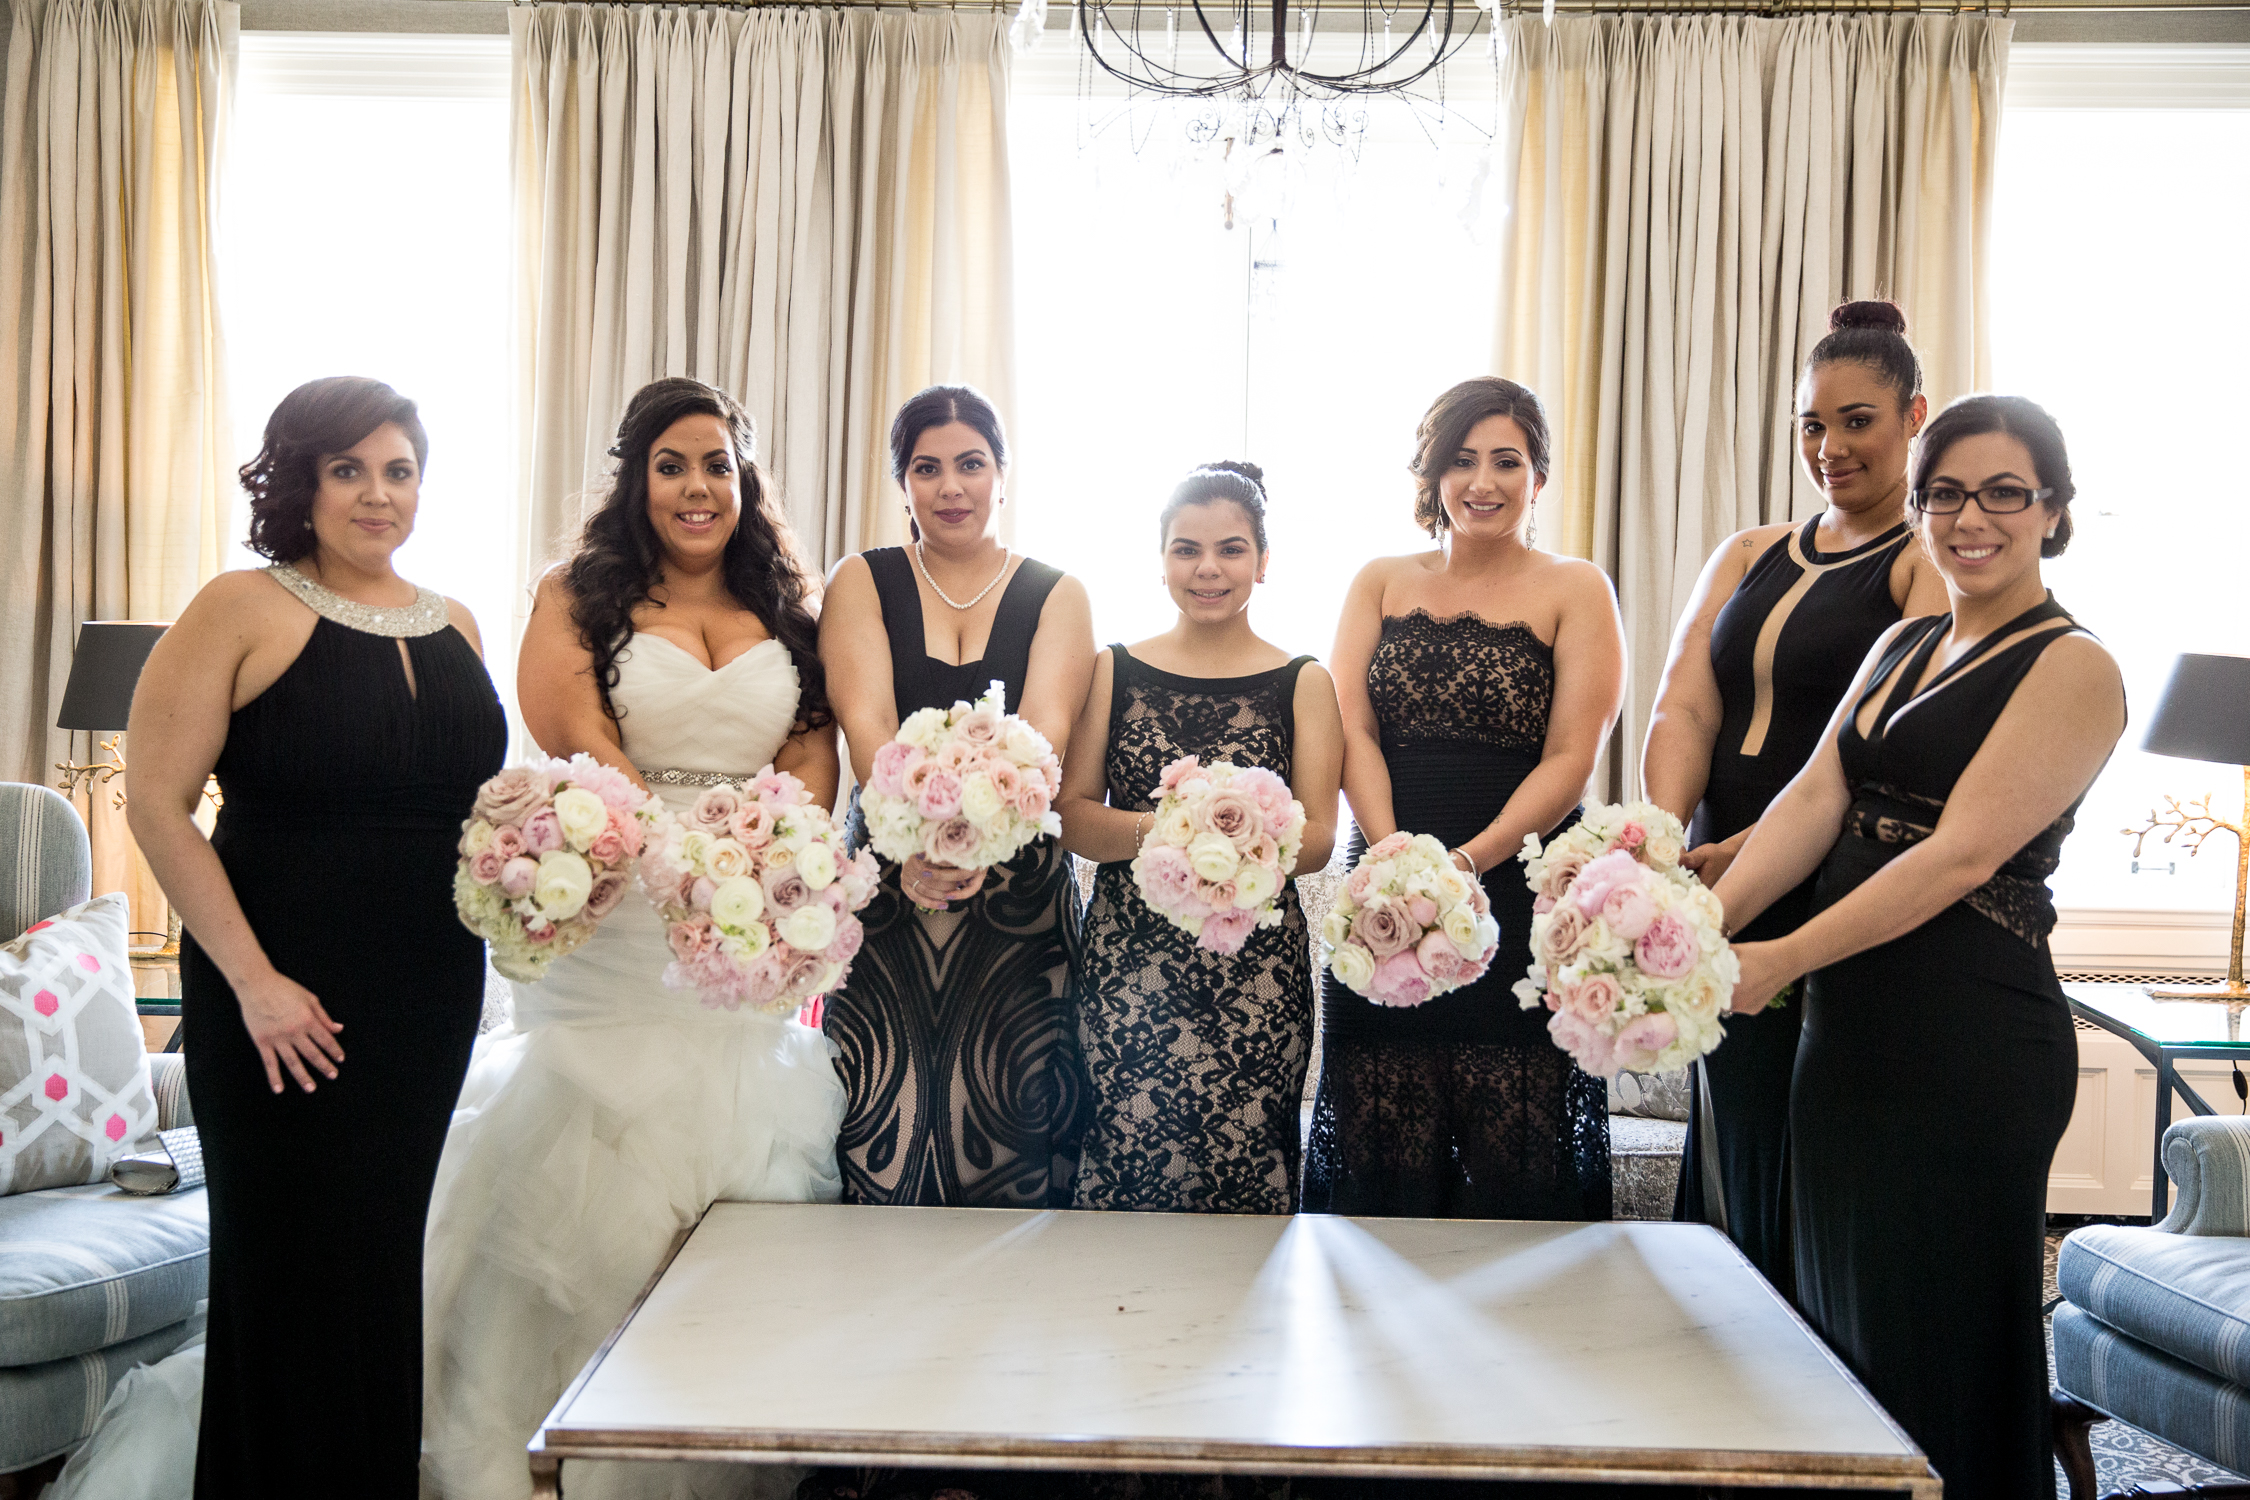 Peter-and-Marie-Wedding-Fontana-Primavera-Graydon-Hall-Manor-Toronto-Ontario-Canada-0019.jpg